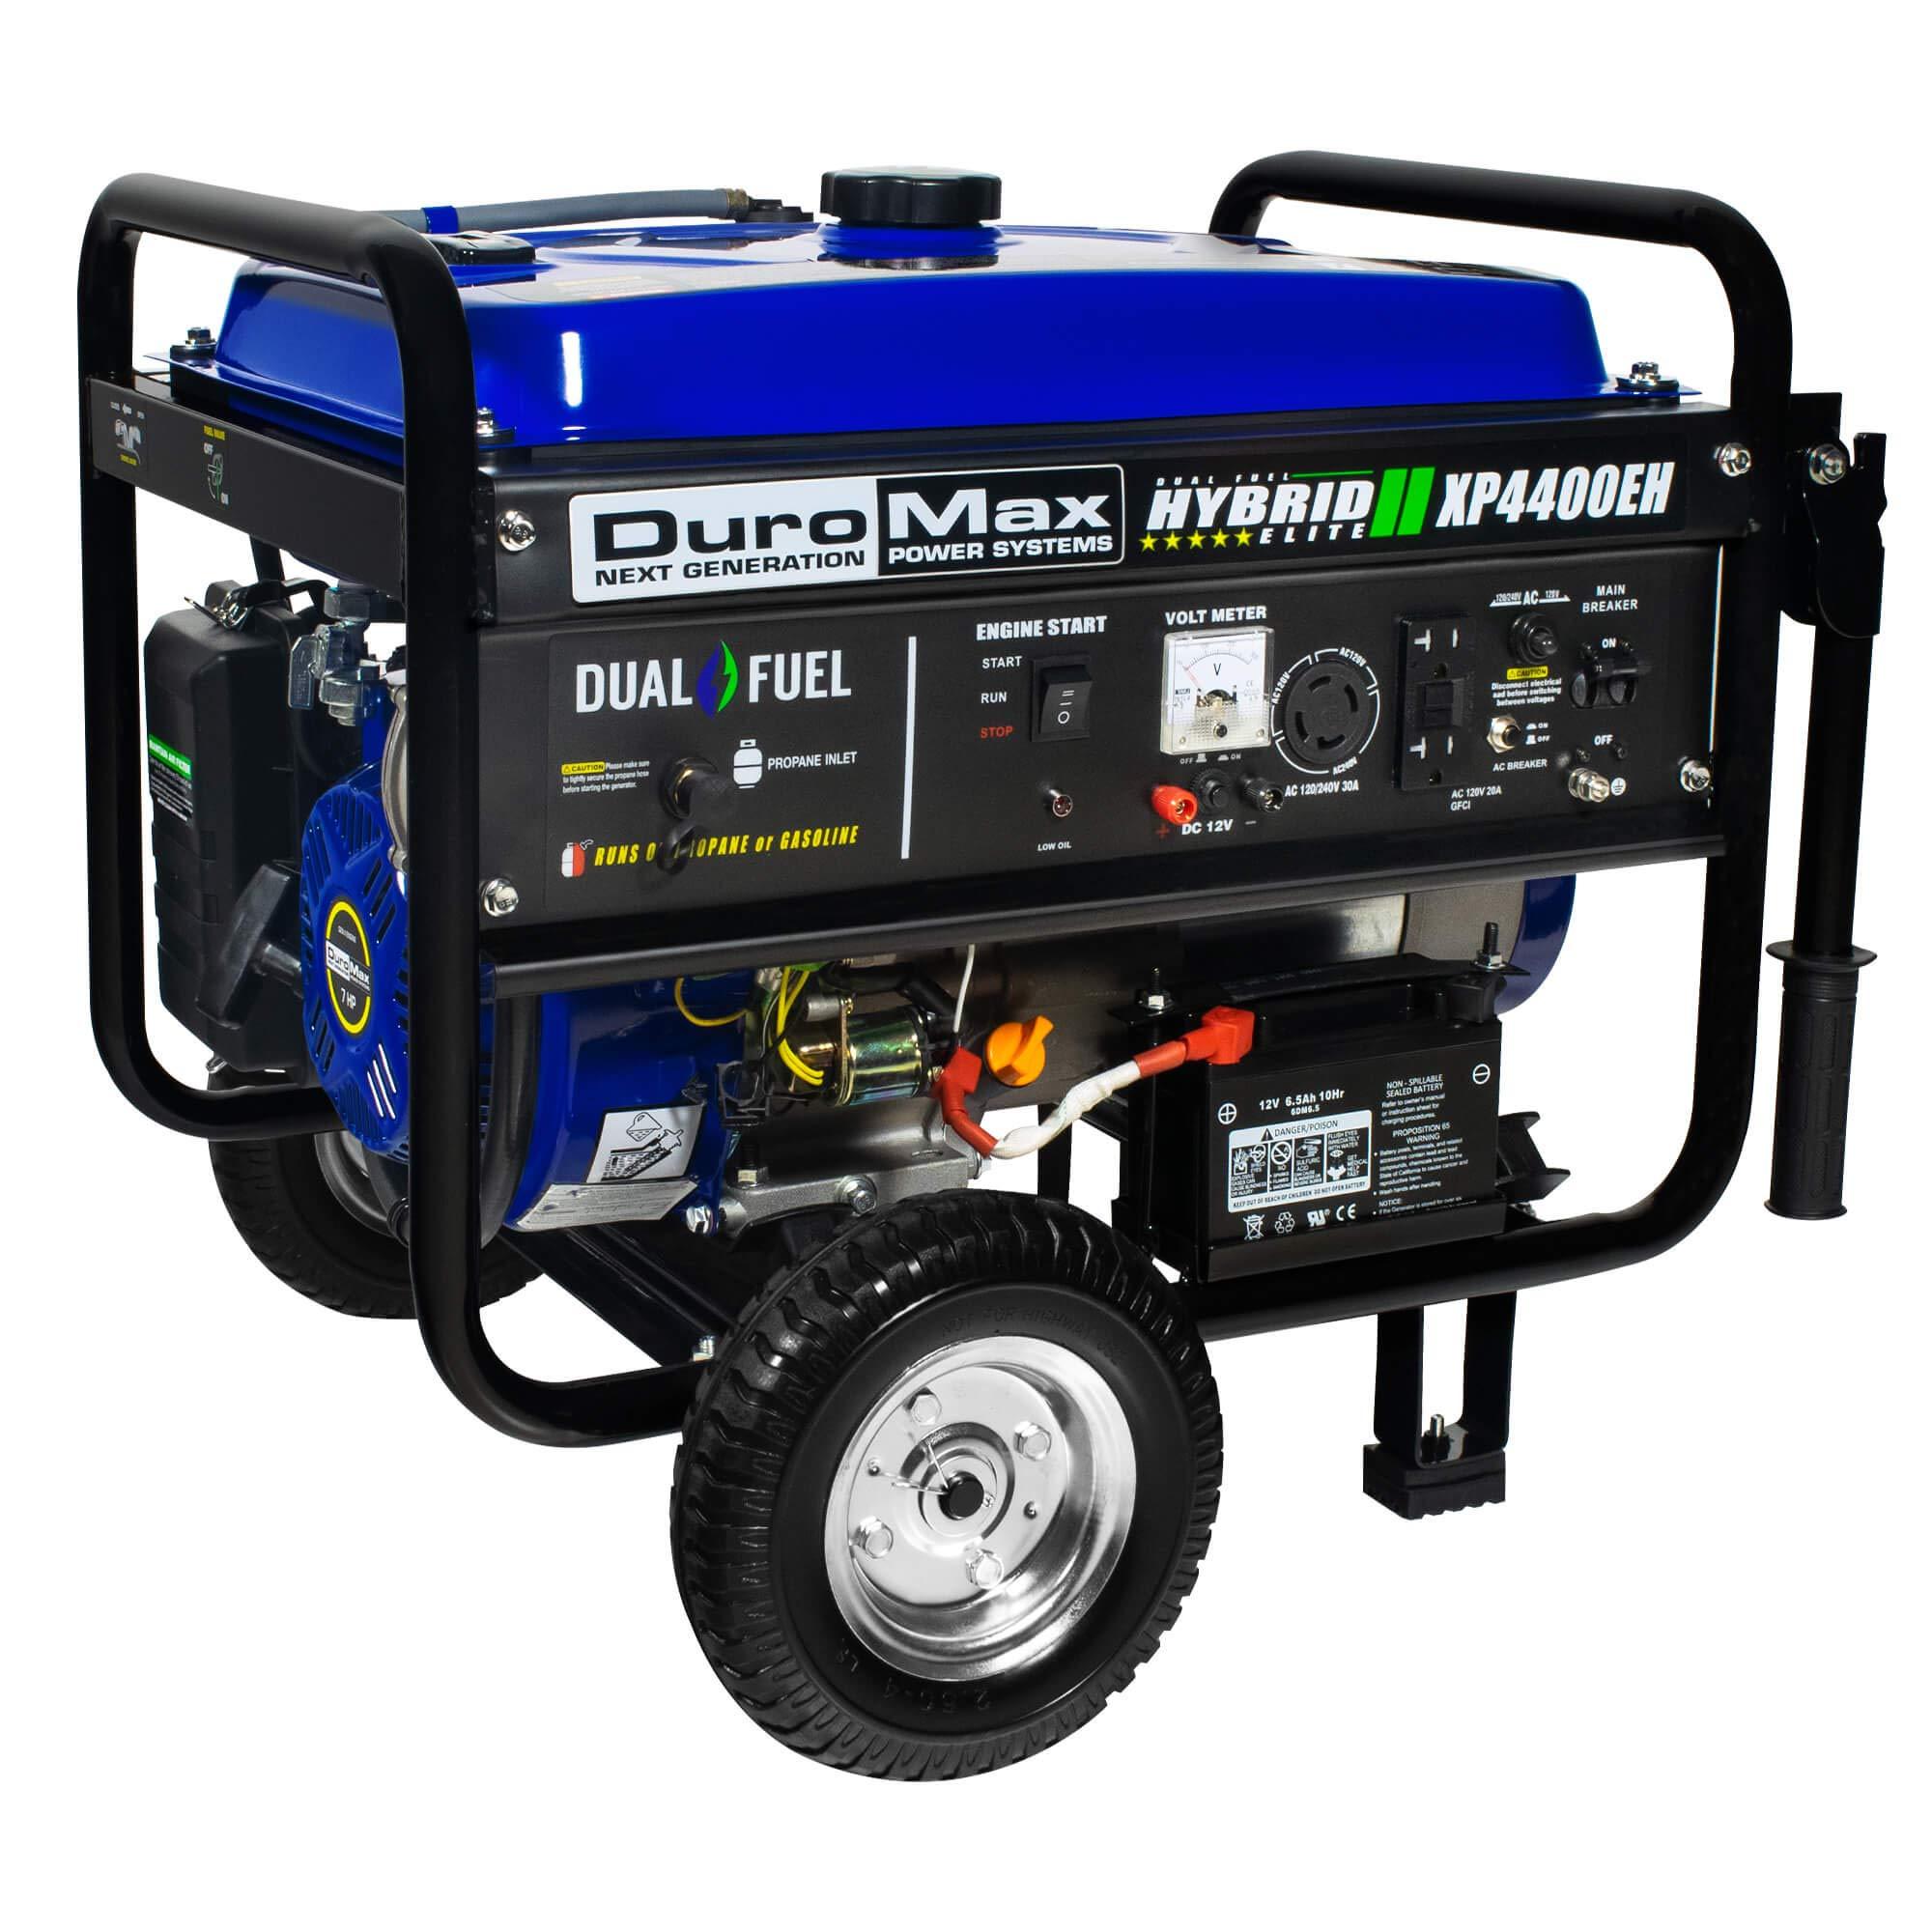 DuroMax Hybrid Dual Fuel XP4400EH 4,400-Watt Portable Generator by DuroMax (Image #3)